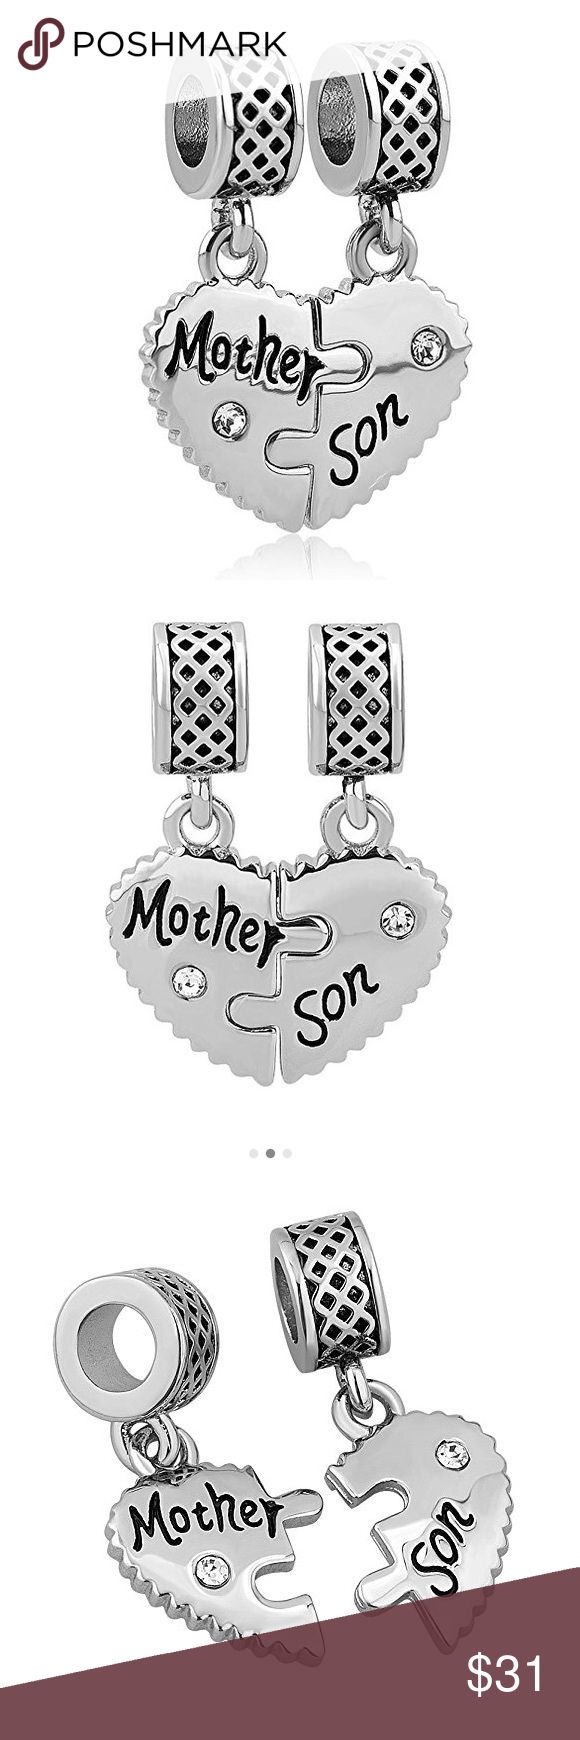 Mom Mother Son Love Heart Charm Beads Mom Mother Son Love Heart Charm Beads For Snake Chain Bracelet Pandora Jewelry Bracelets